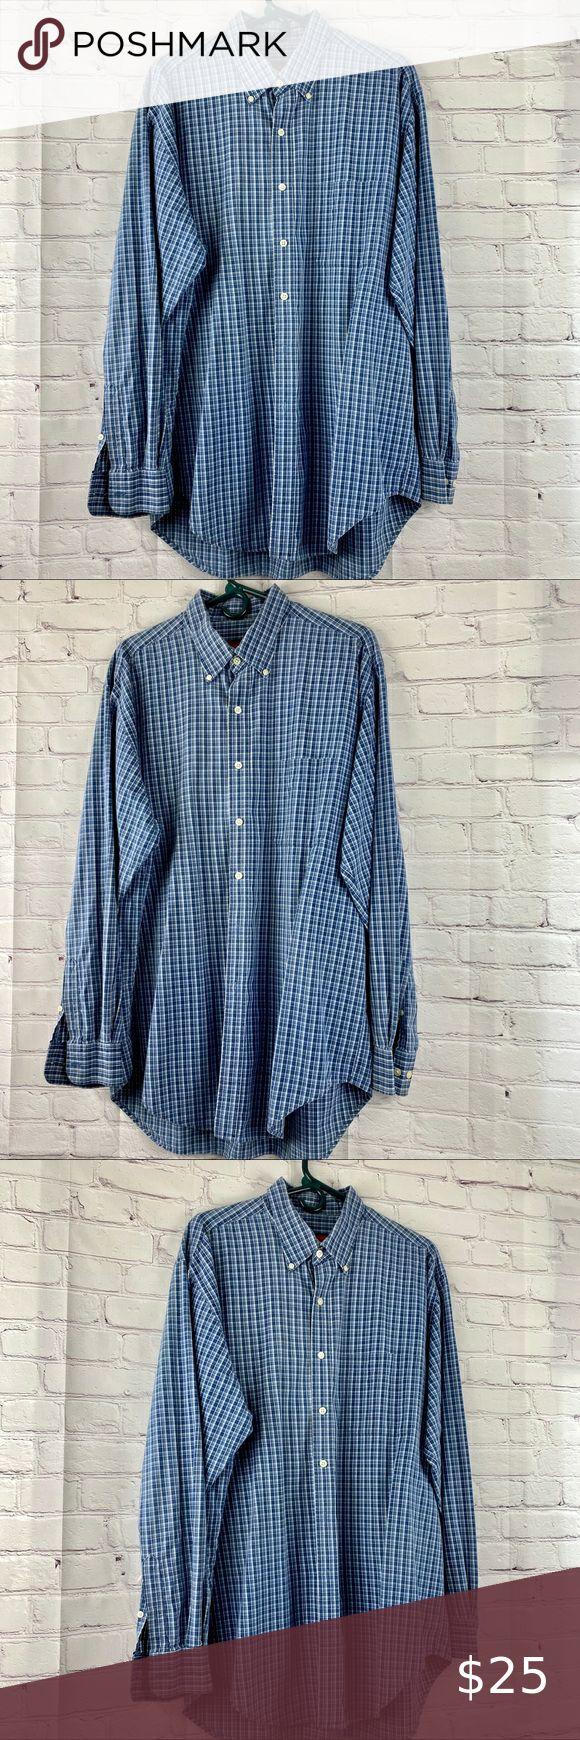 Austin Reed Blue Checkered Shirt In 2020 Blue Checkered Shirt Blue Checkered Checkered Dress